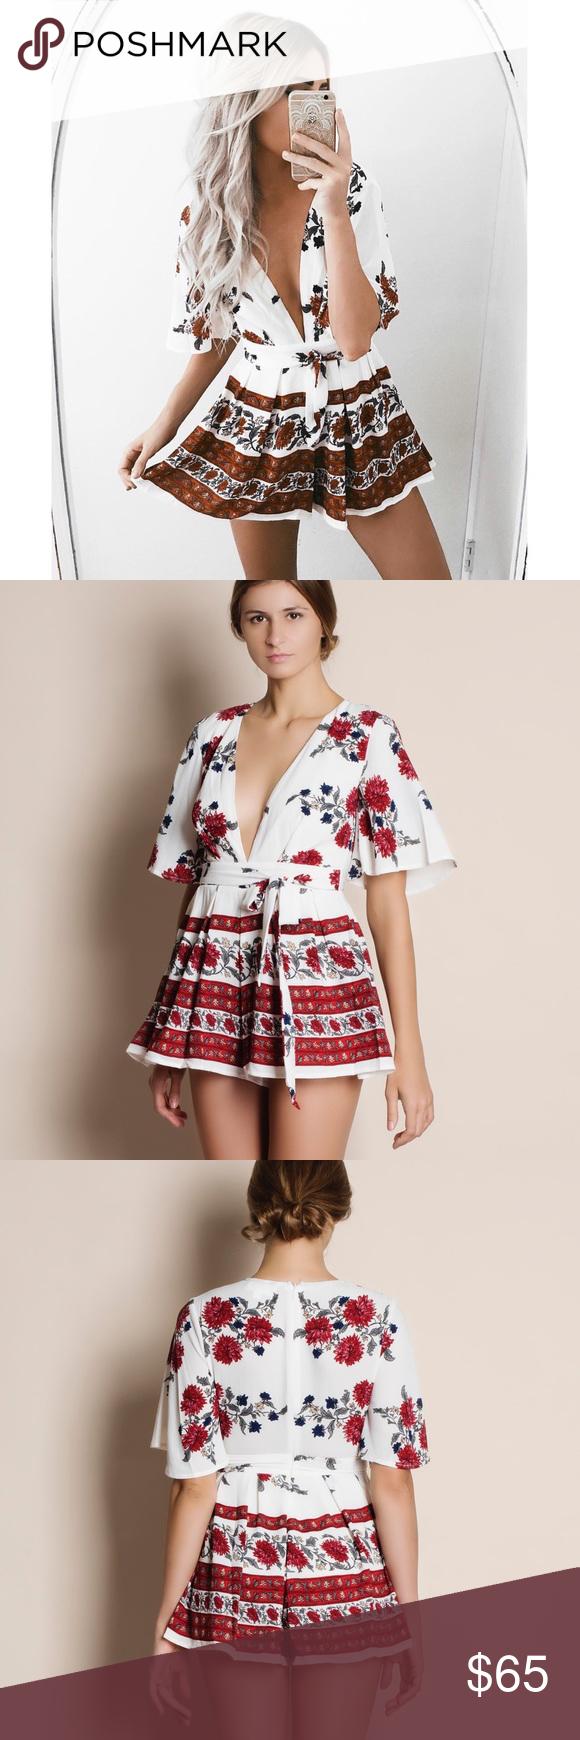 db22e2d7c73 Paradiso White   Red Floral Romper Boutique